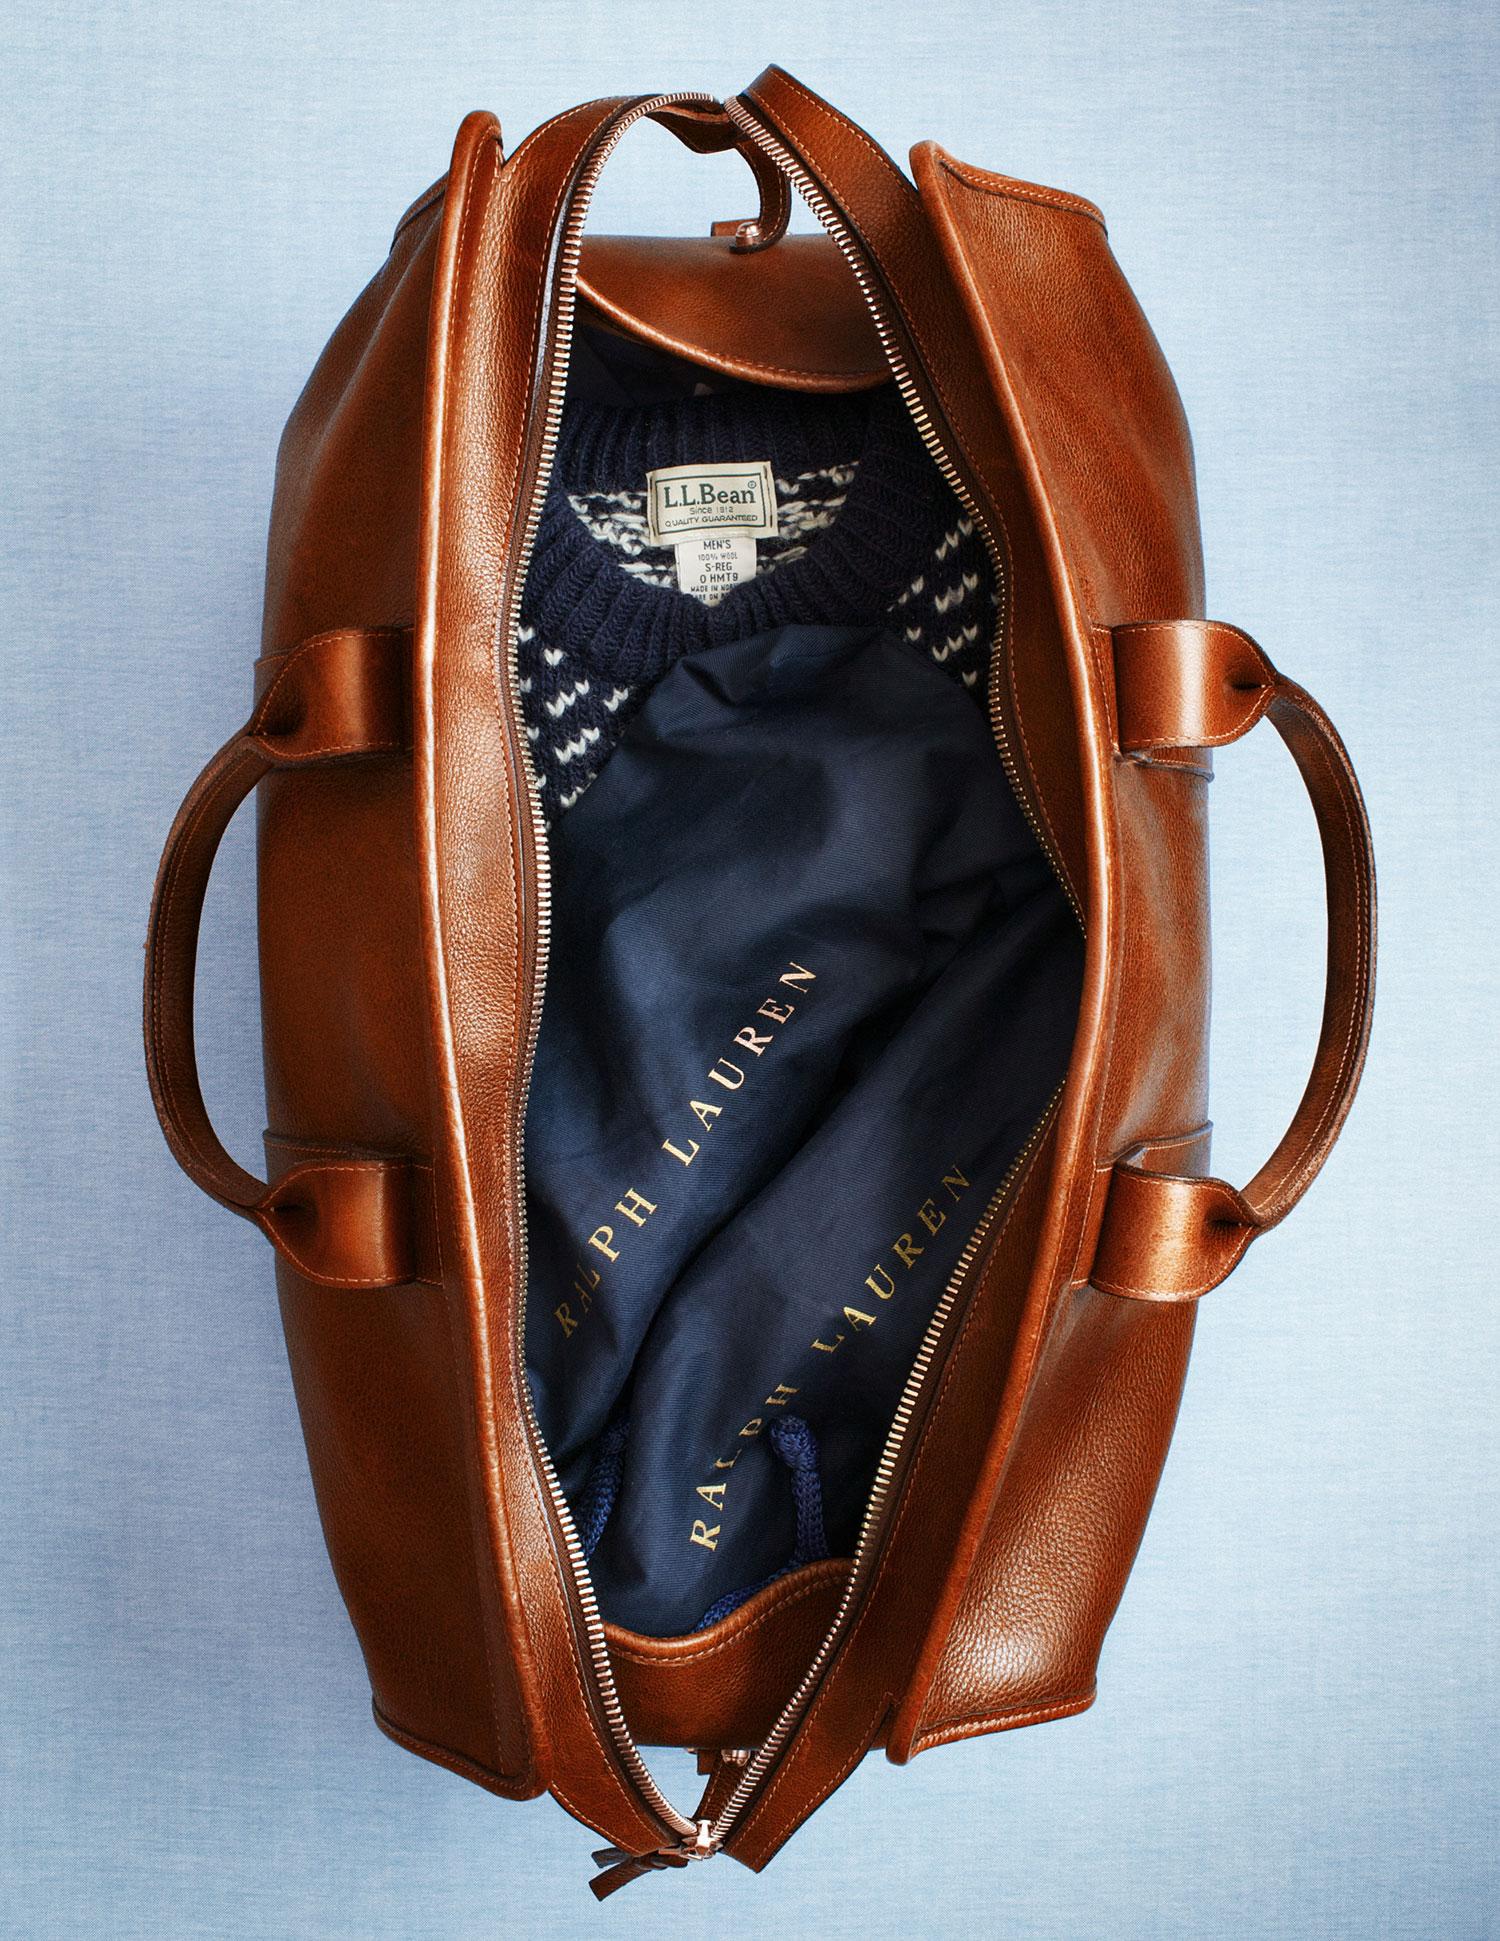 ddbe6998ca Frank Clegg Leatherworks Signature Duffle — F.E. Castleberry